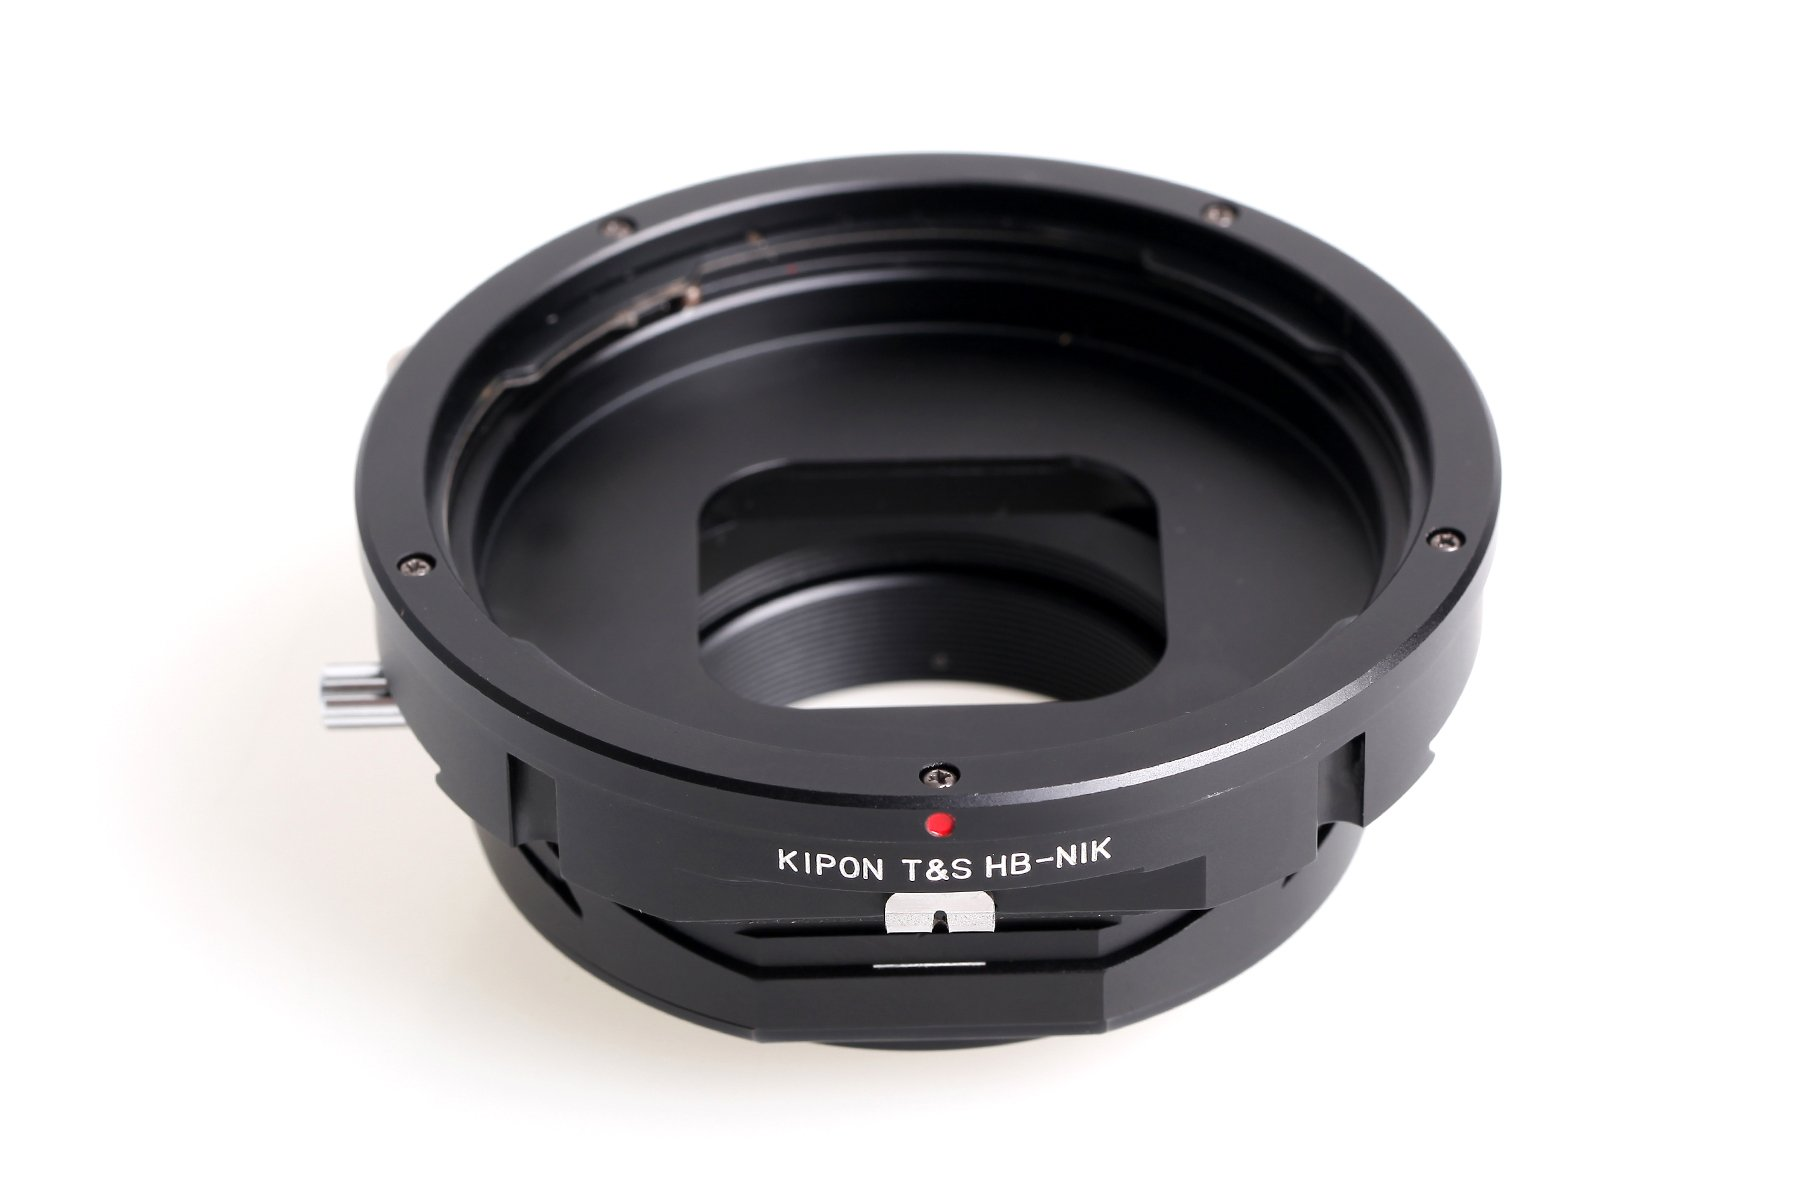 KIPON tilt&shift adaptér objektivu Hasselblad V na tělo Nikon